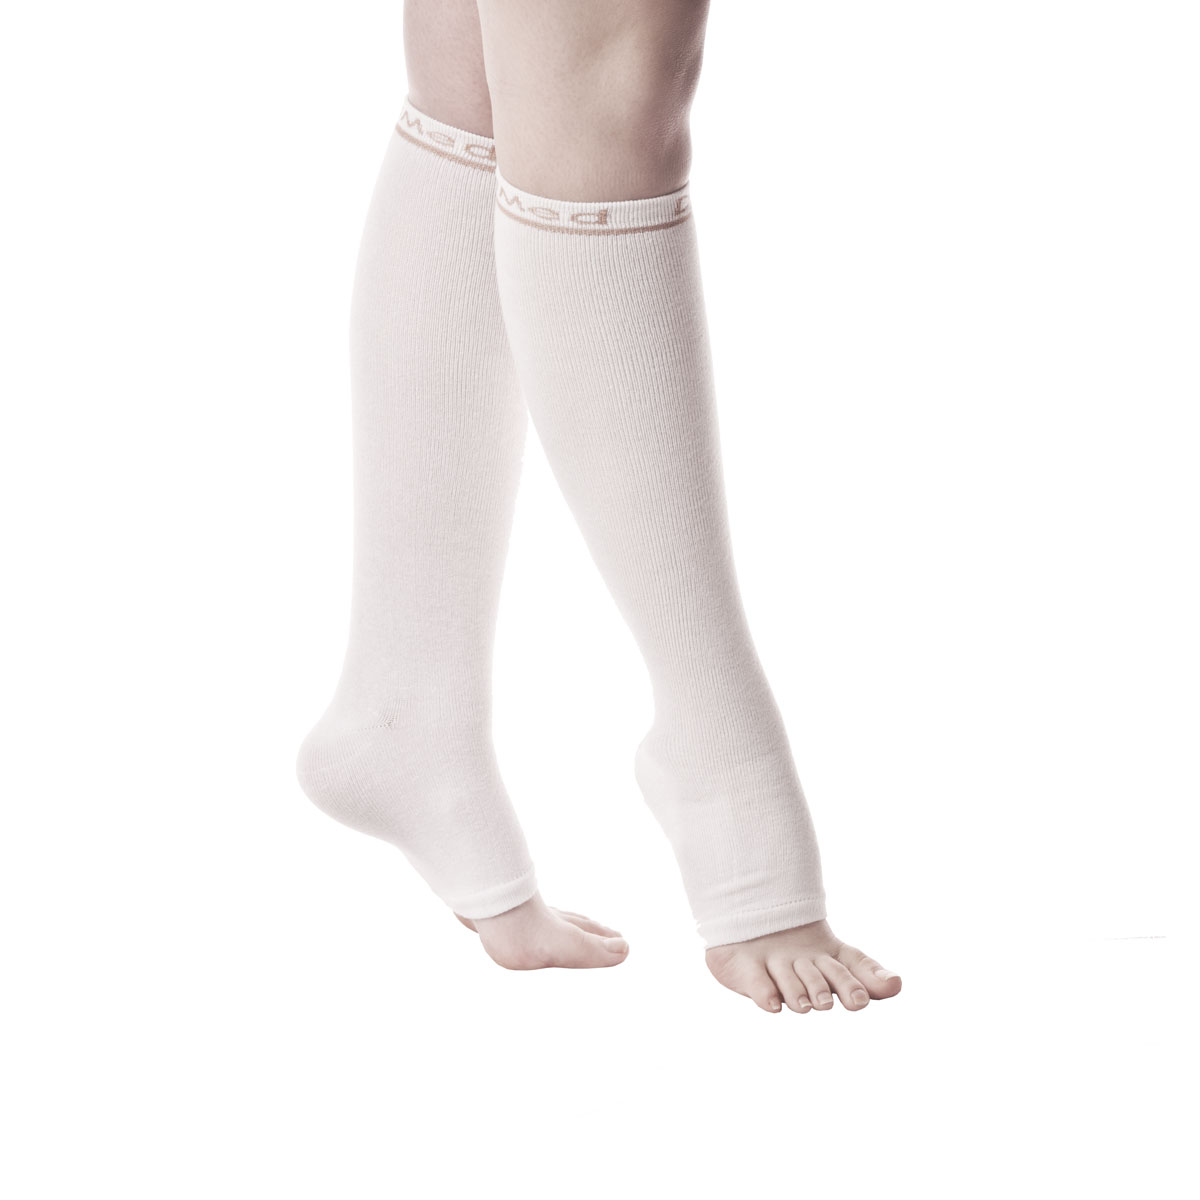 Skin Protectors For Legs White